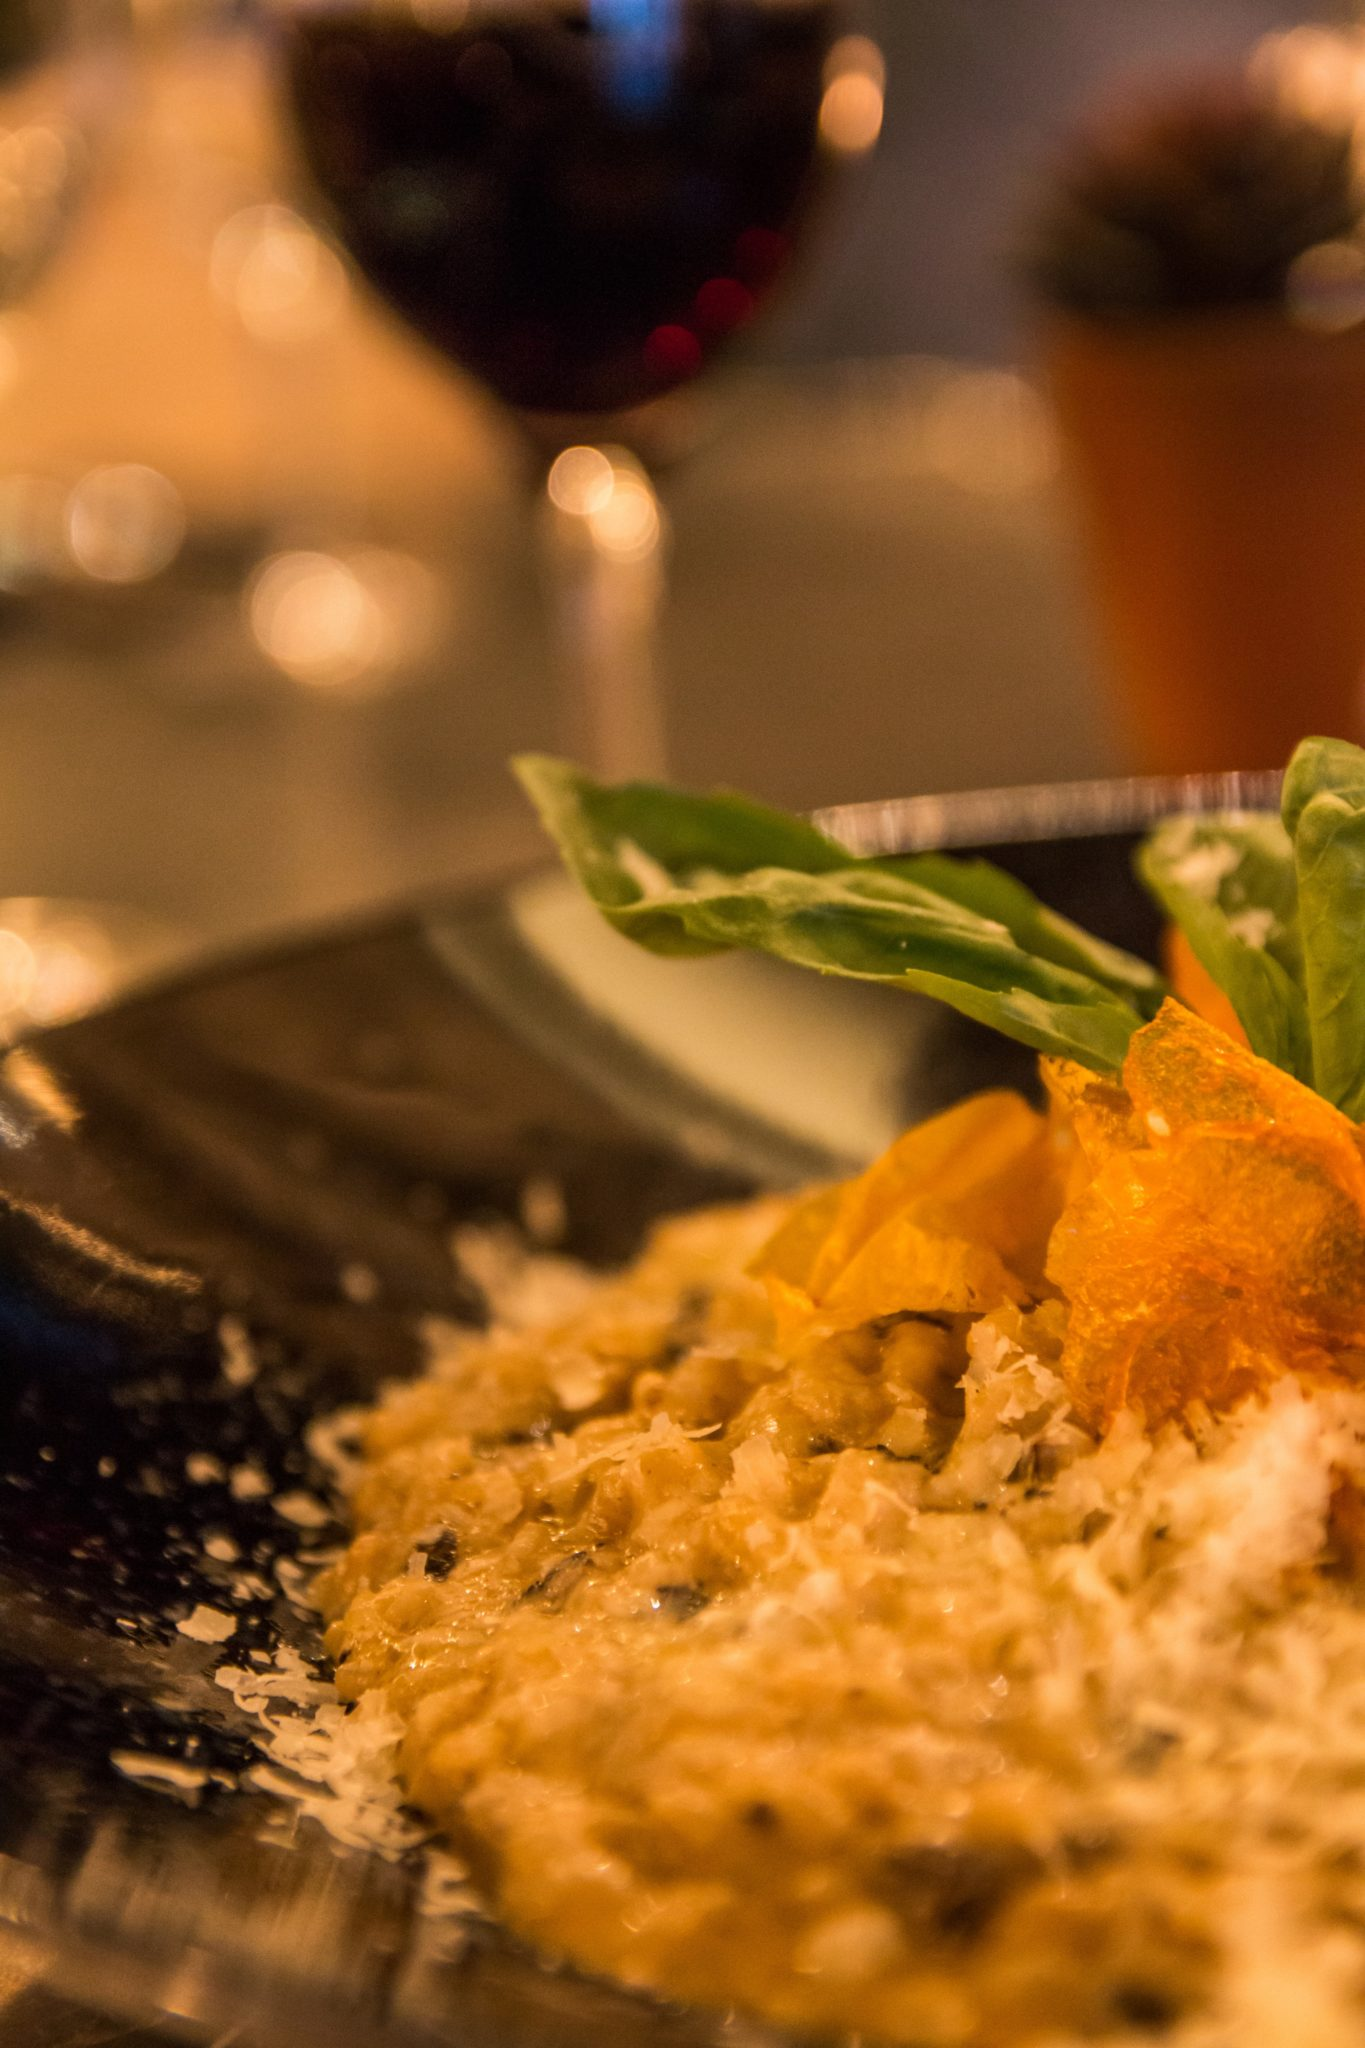 Tremento - Sabores - Restaurant Breda - Photography